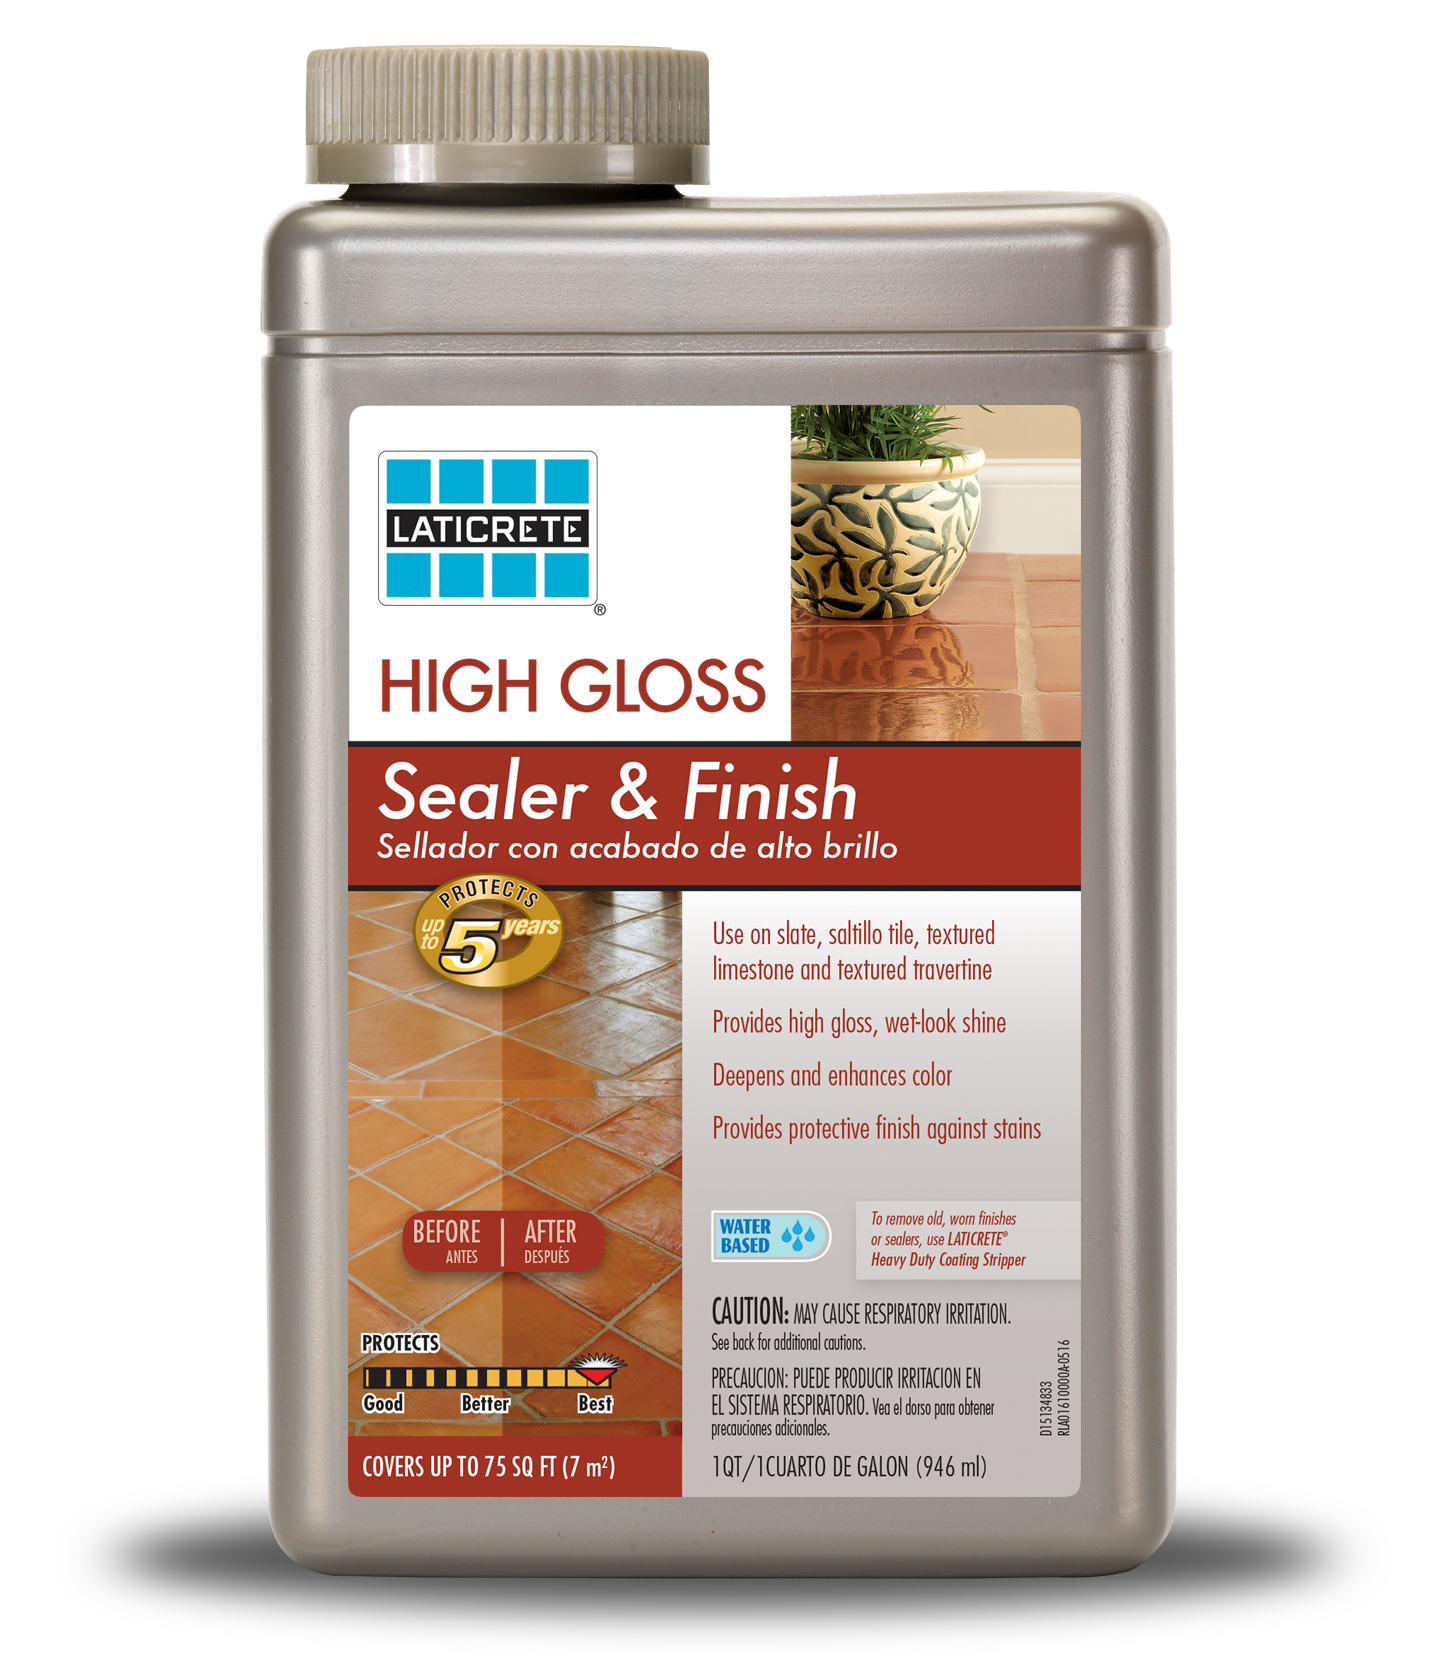 LATICRETE® High Gloss Sealer & Finish